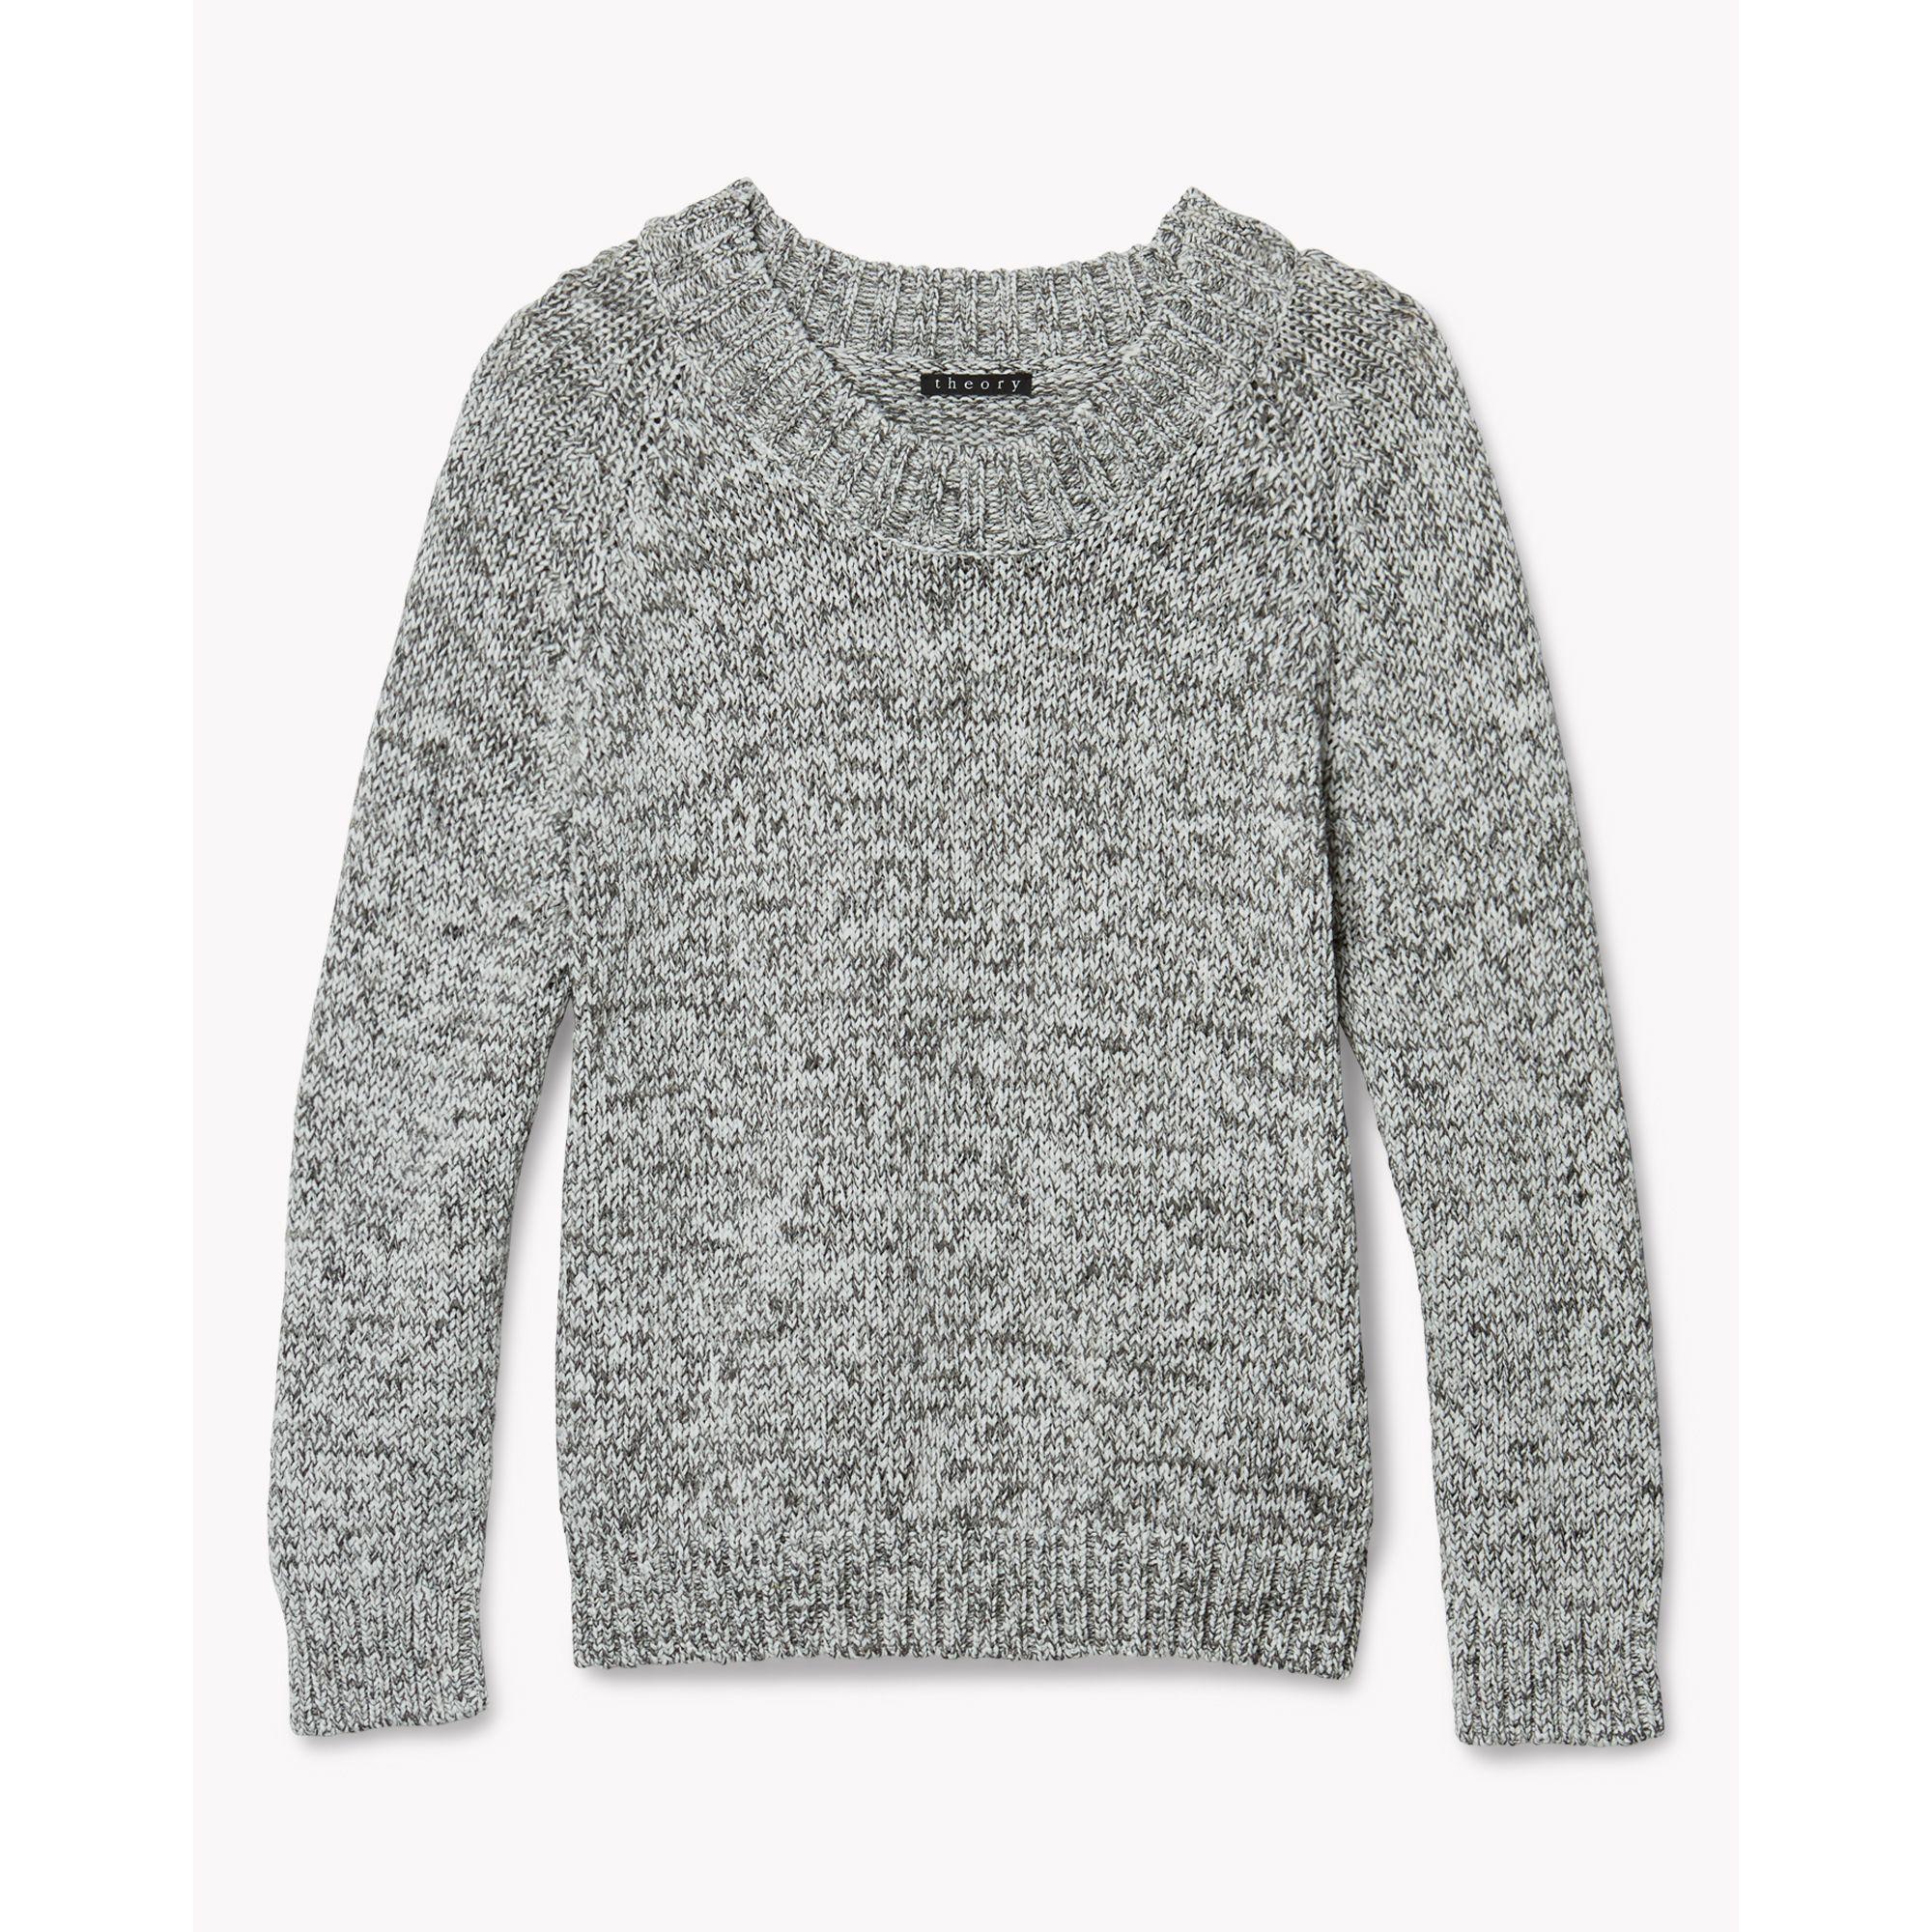 Marled Crewneck Sweater 8326UYxmE